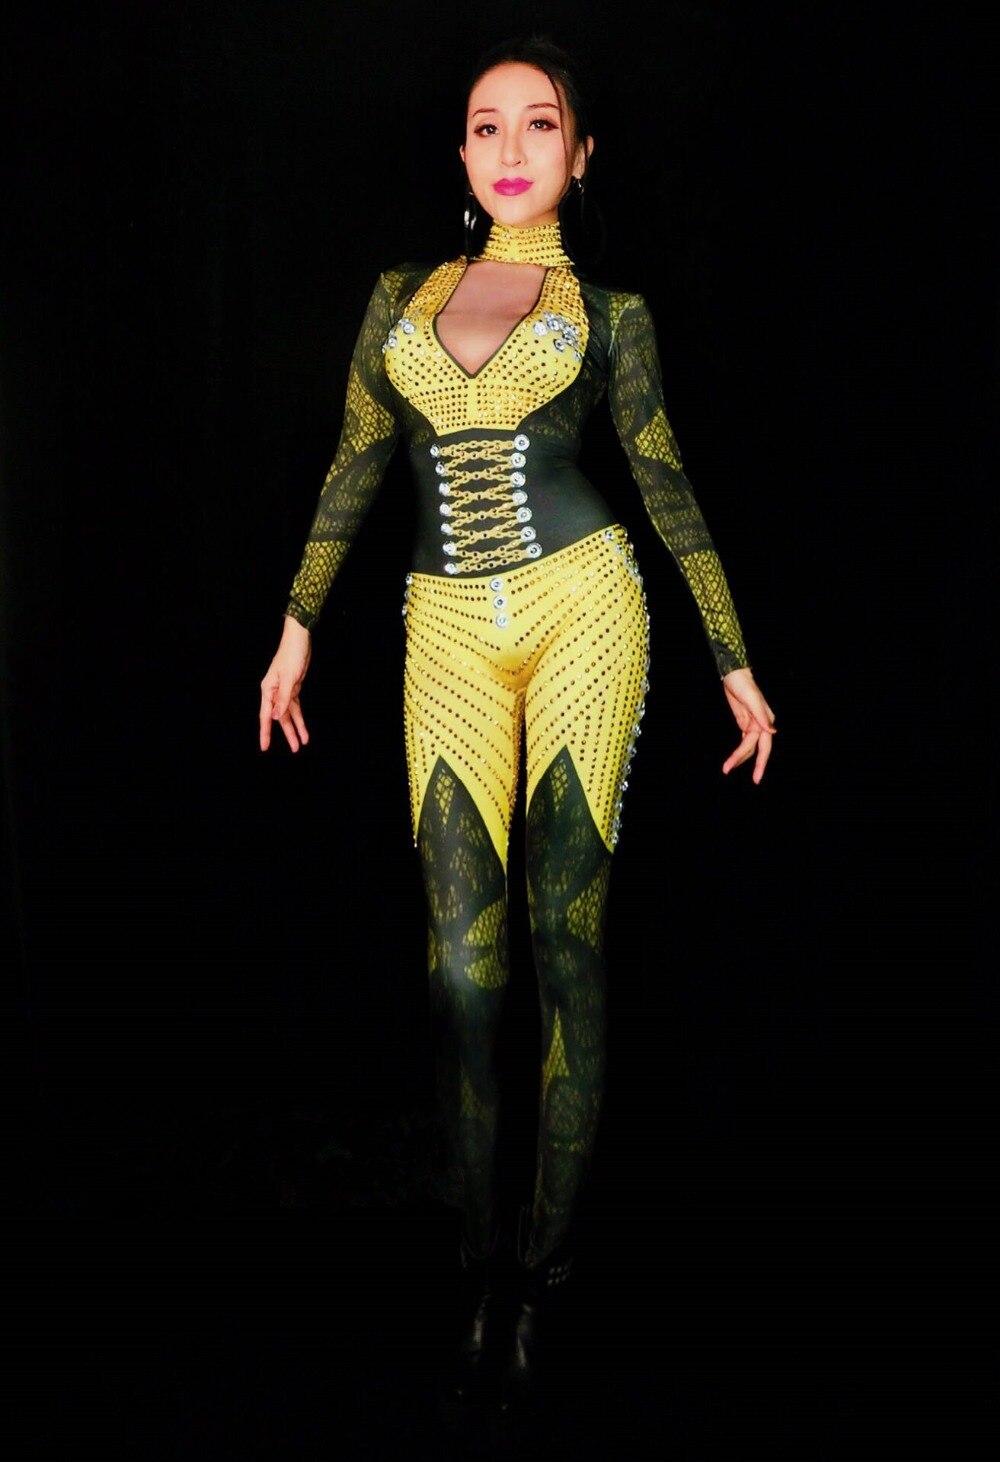 Yellow Crystal Diamond bodysuit Female DJ Singer Costume European Bar Dancer Pole dance Stage Outfit Sexy Stretch Leotard Romper